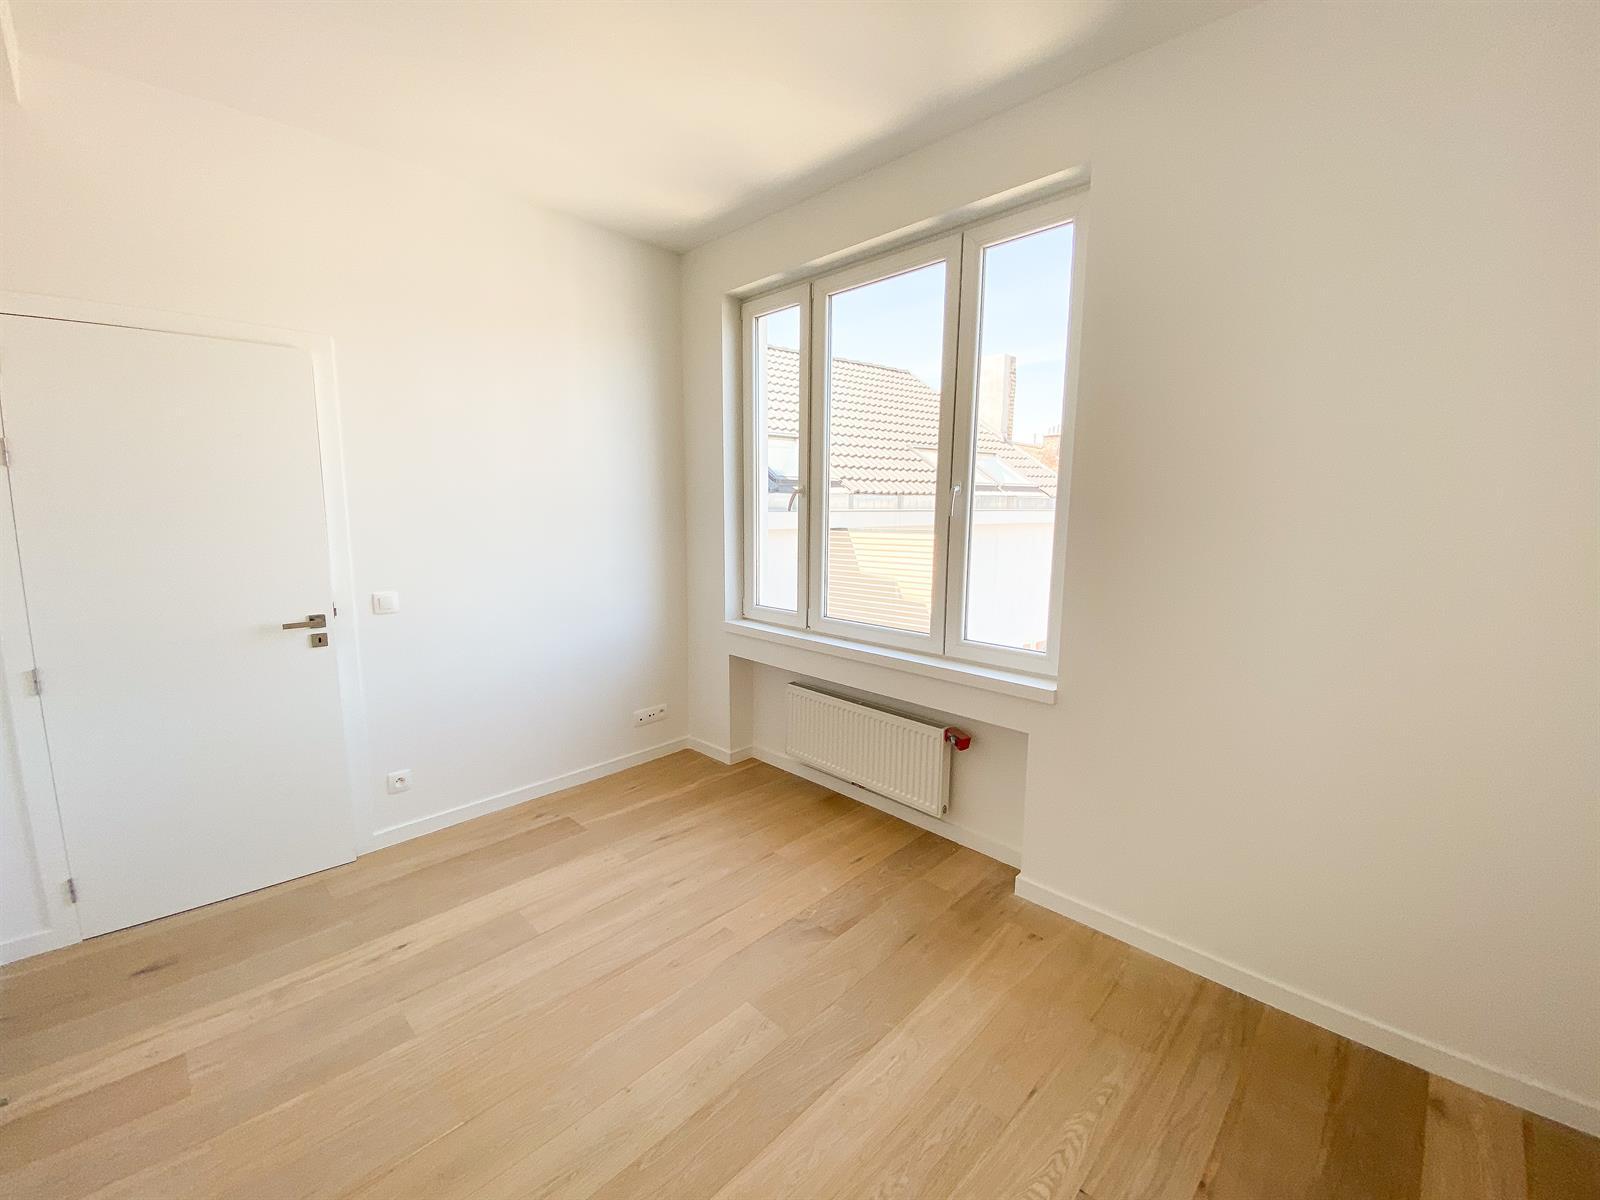 Appartement - Liège - #4045828-11